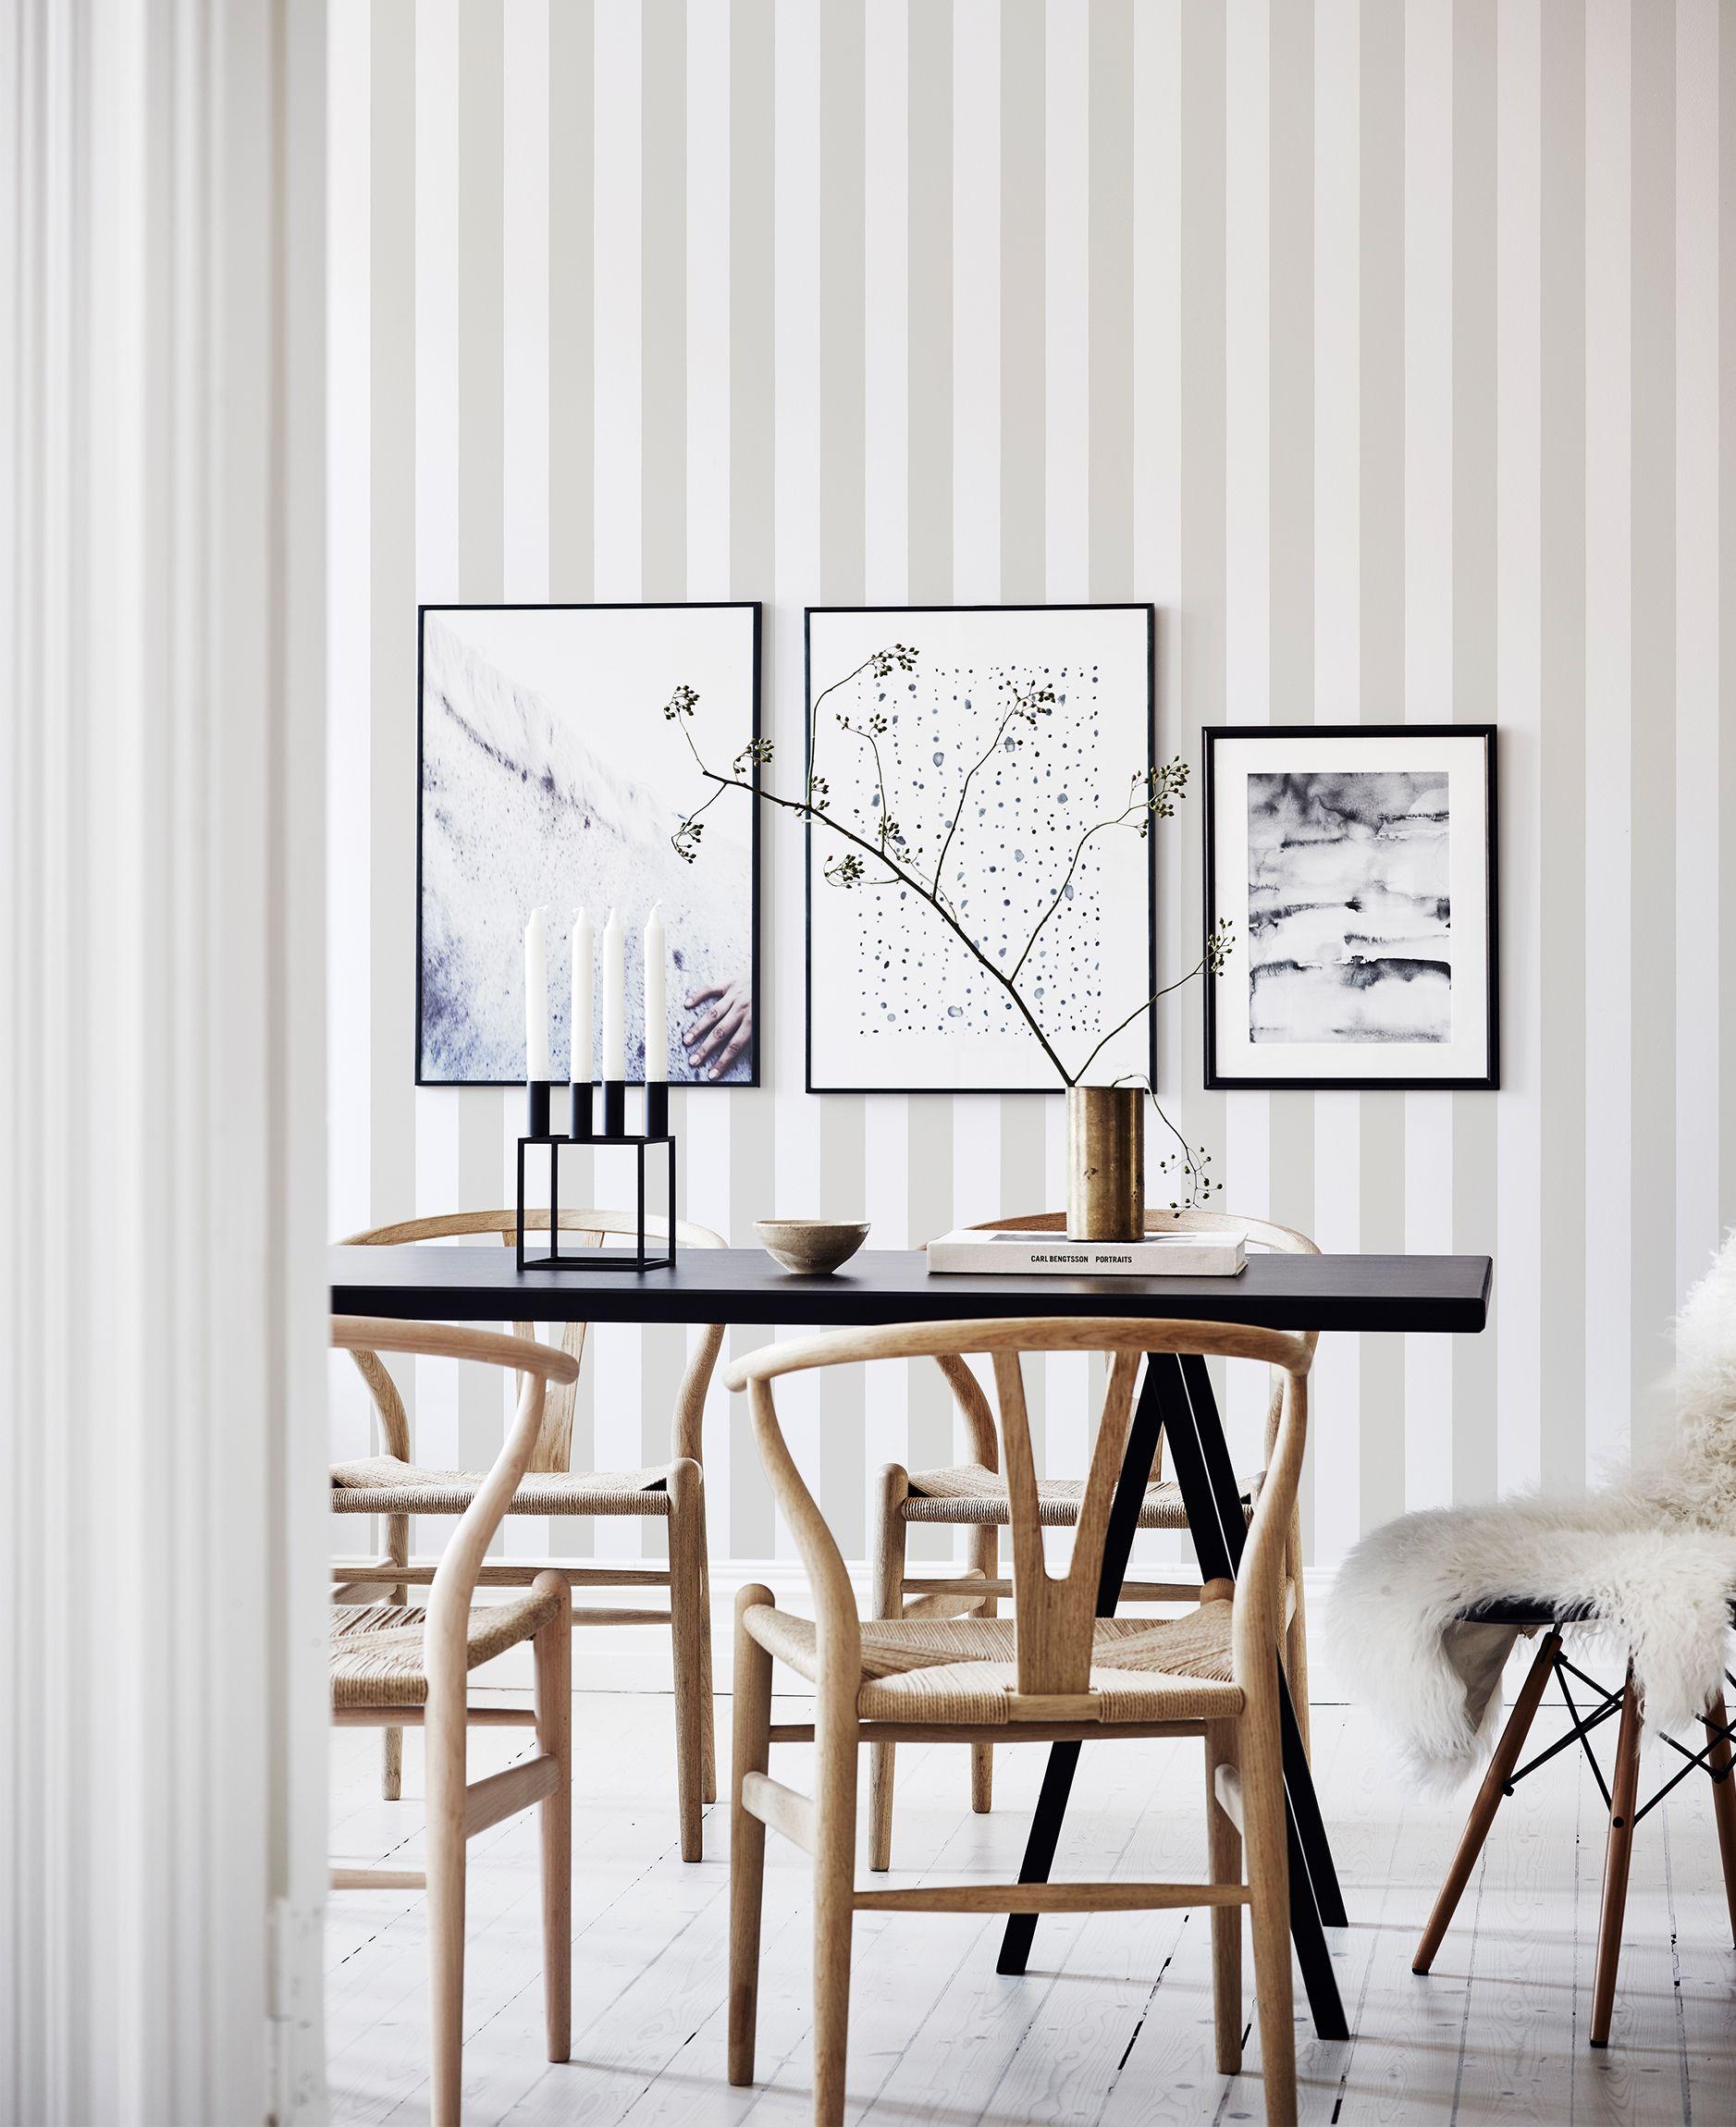 10 striped wallpaper design ideas - Wallpaper Design Ideas